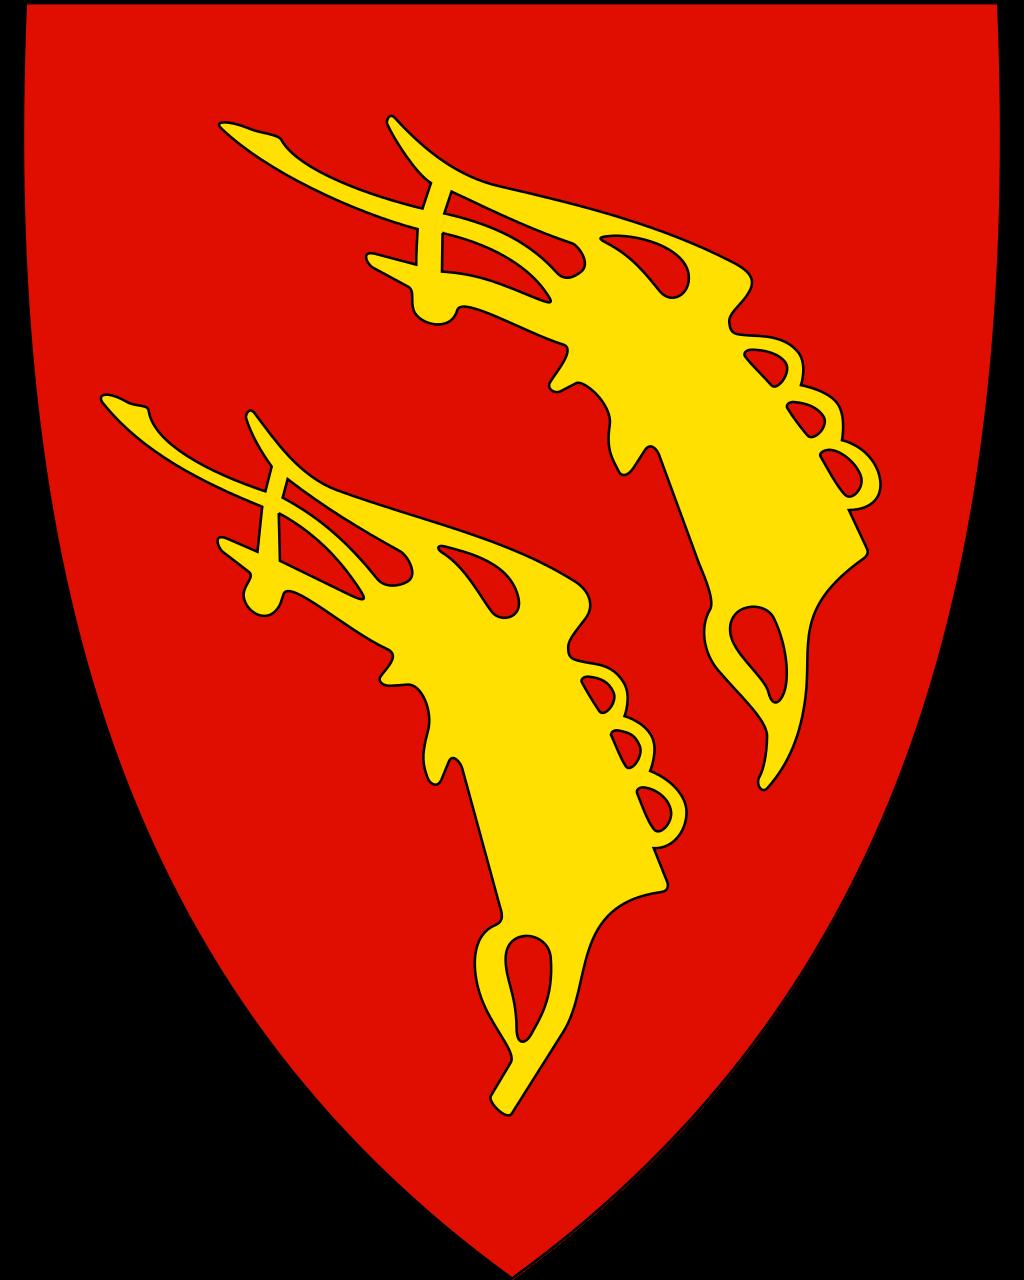 LÆRDAL KOMMUNE logo